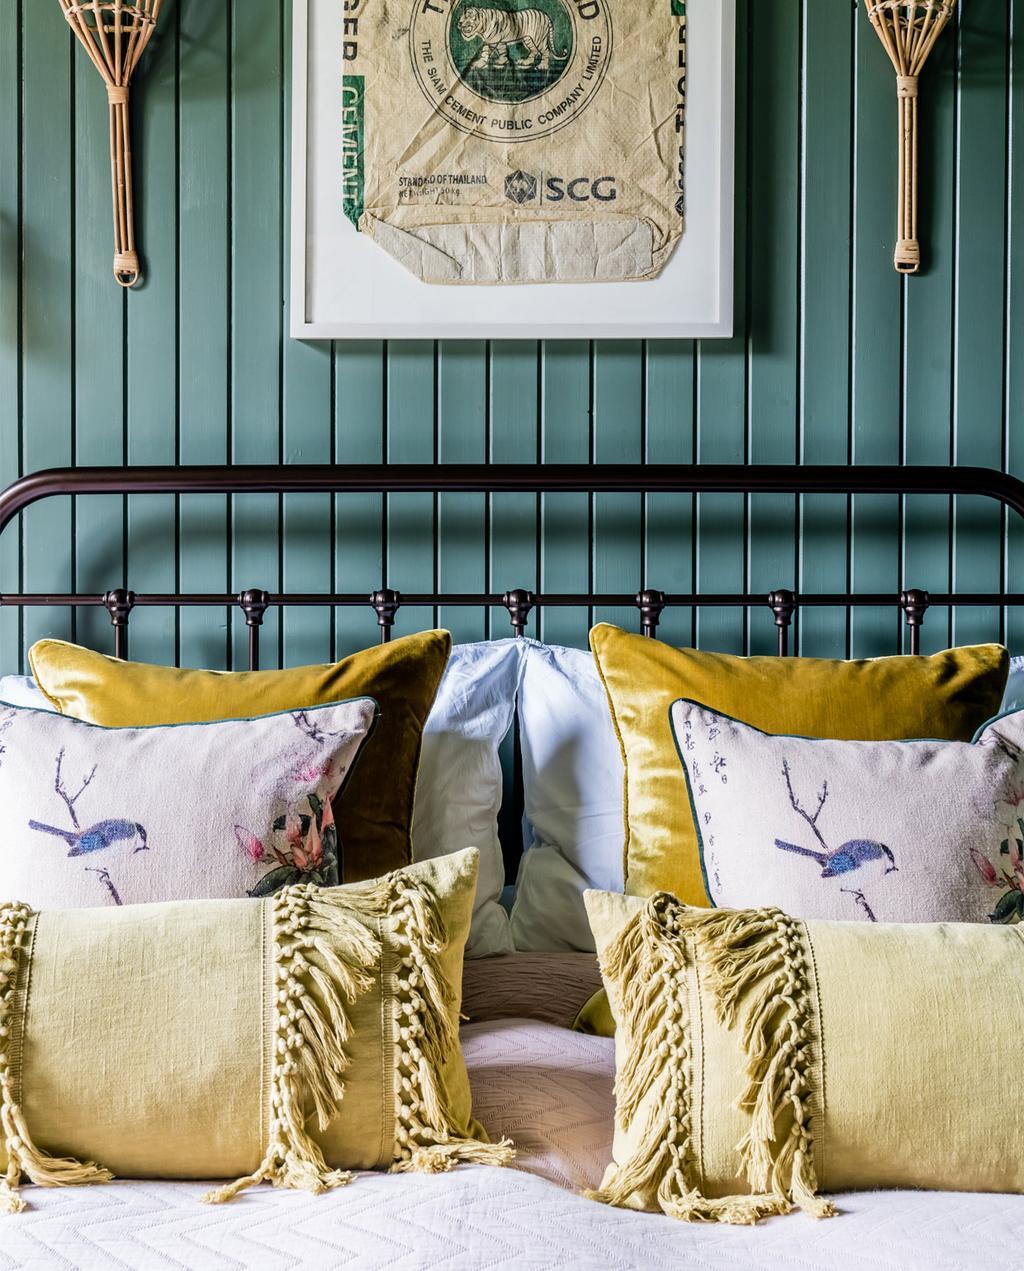 vtwonen | binnenkijken | Edinburgh | slaapkamer